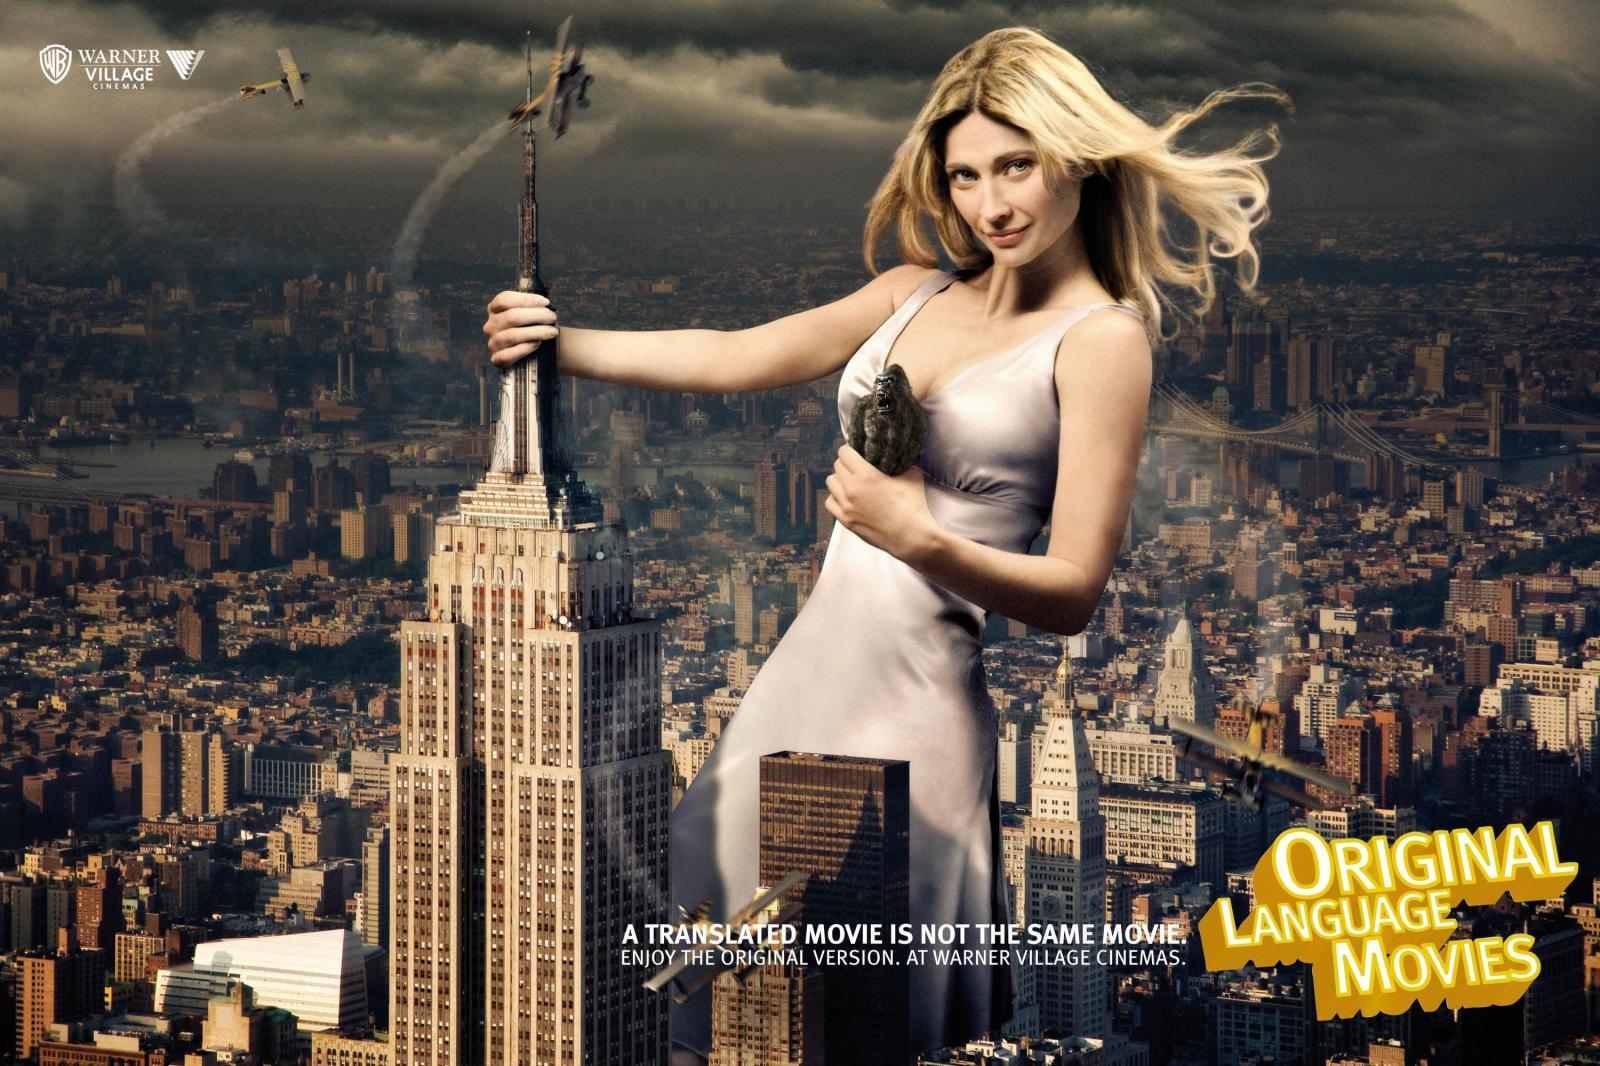 original-language-movie-queen-kong-large